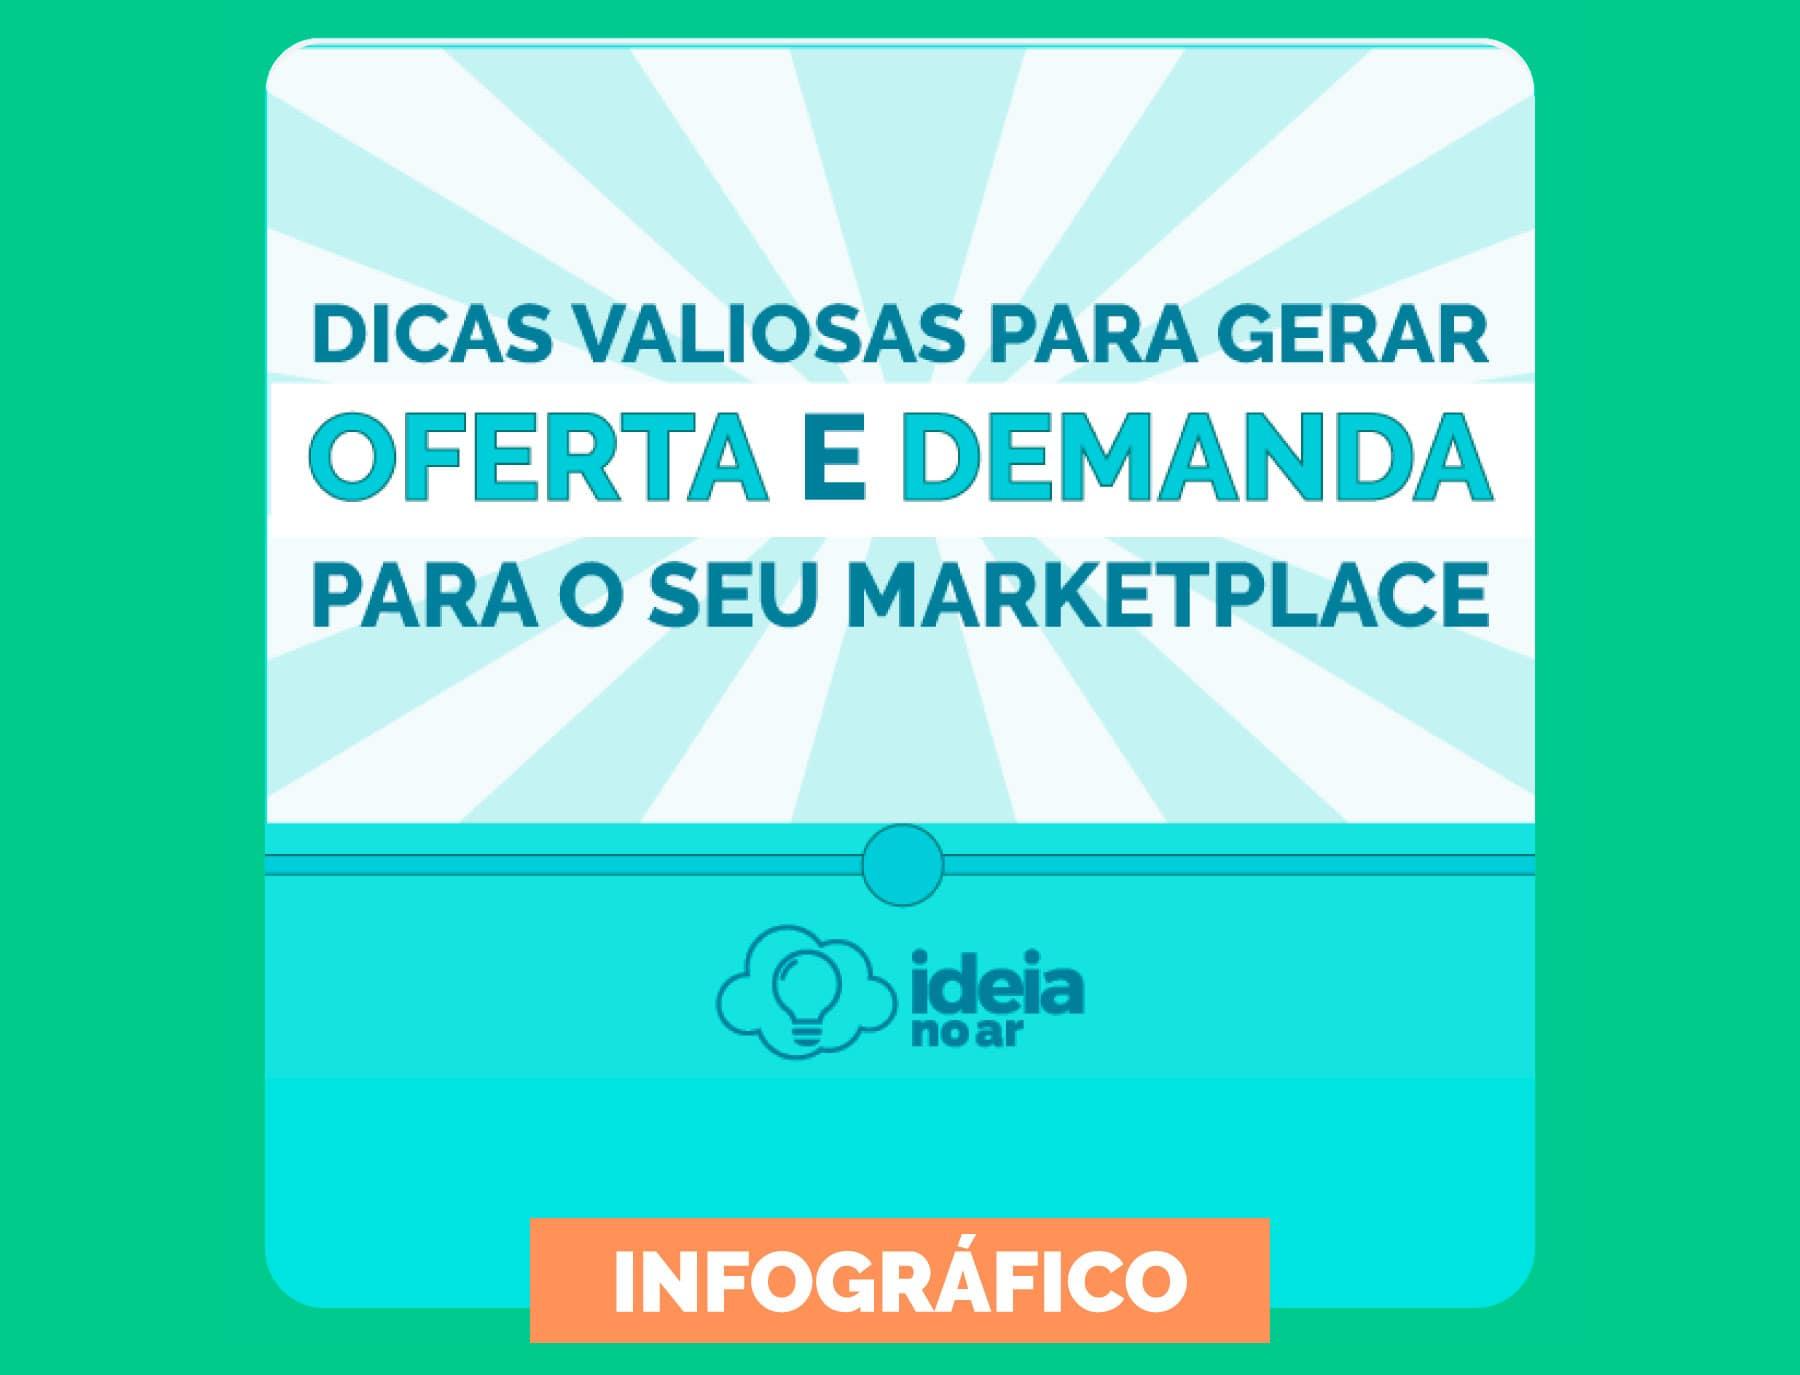 infografico-oferta-demanda-marketplace